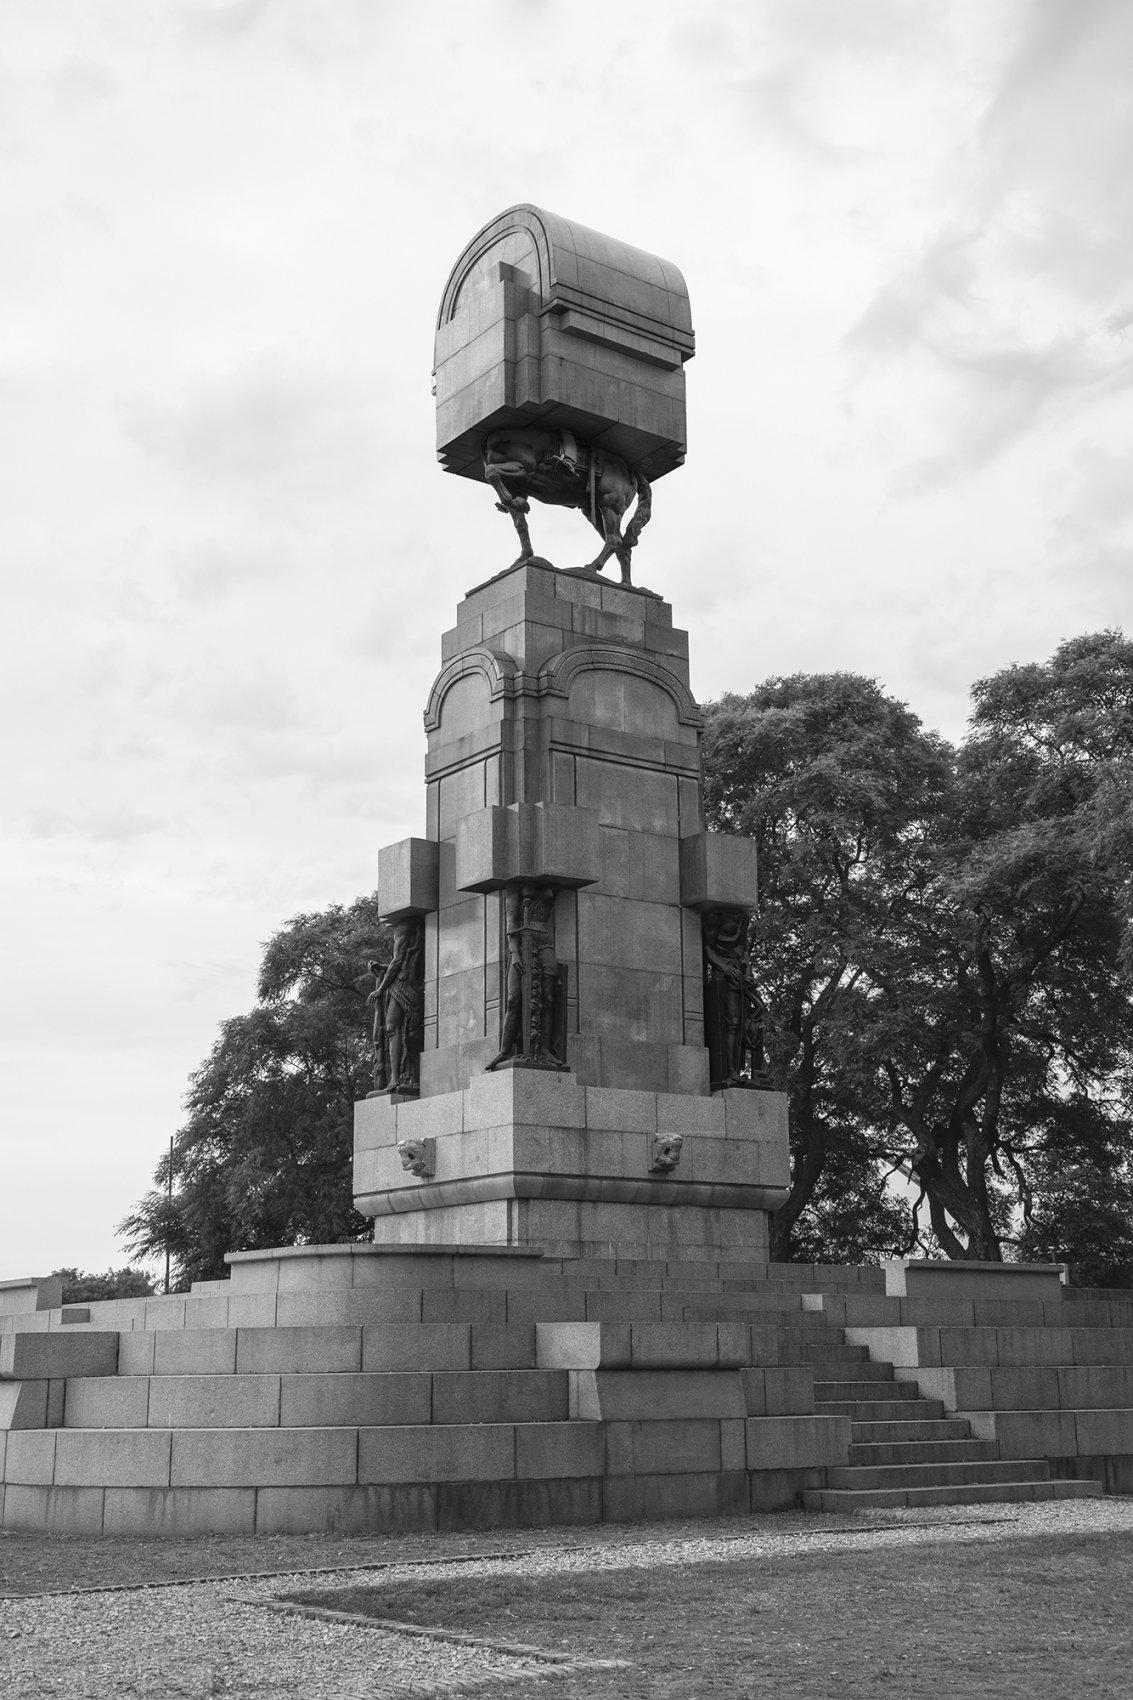 Ecuestre n°7. Serie Monumento Editado, Chile-Perú-Bolivia-Argentina